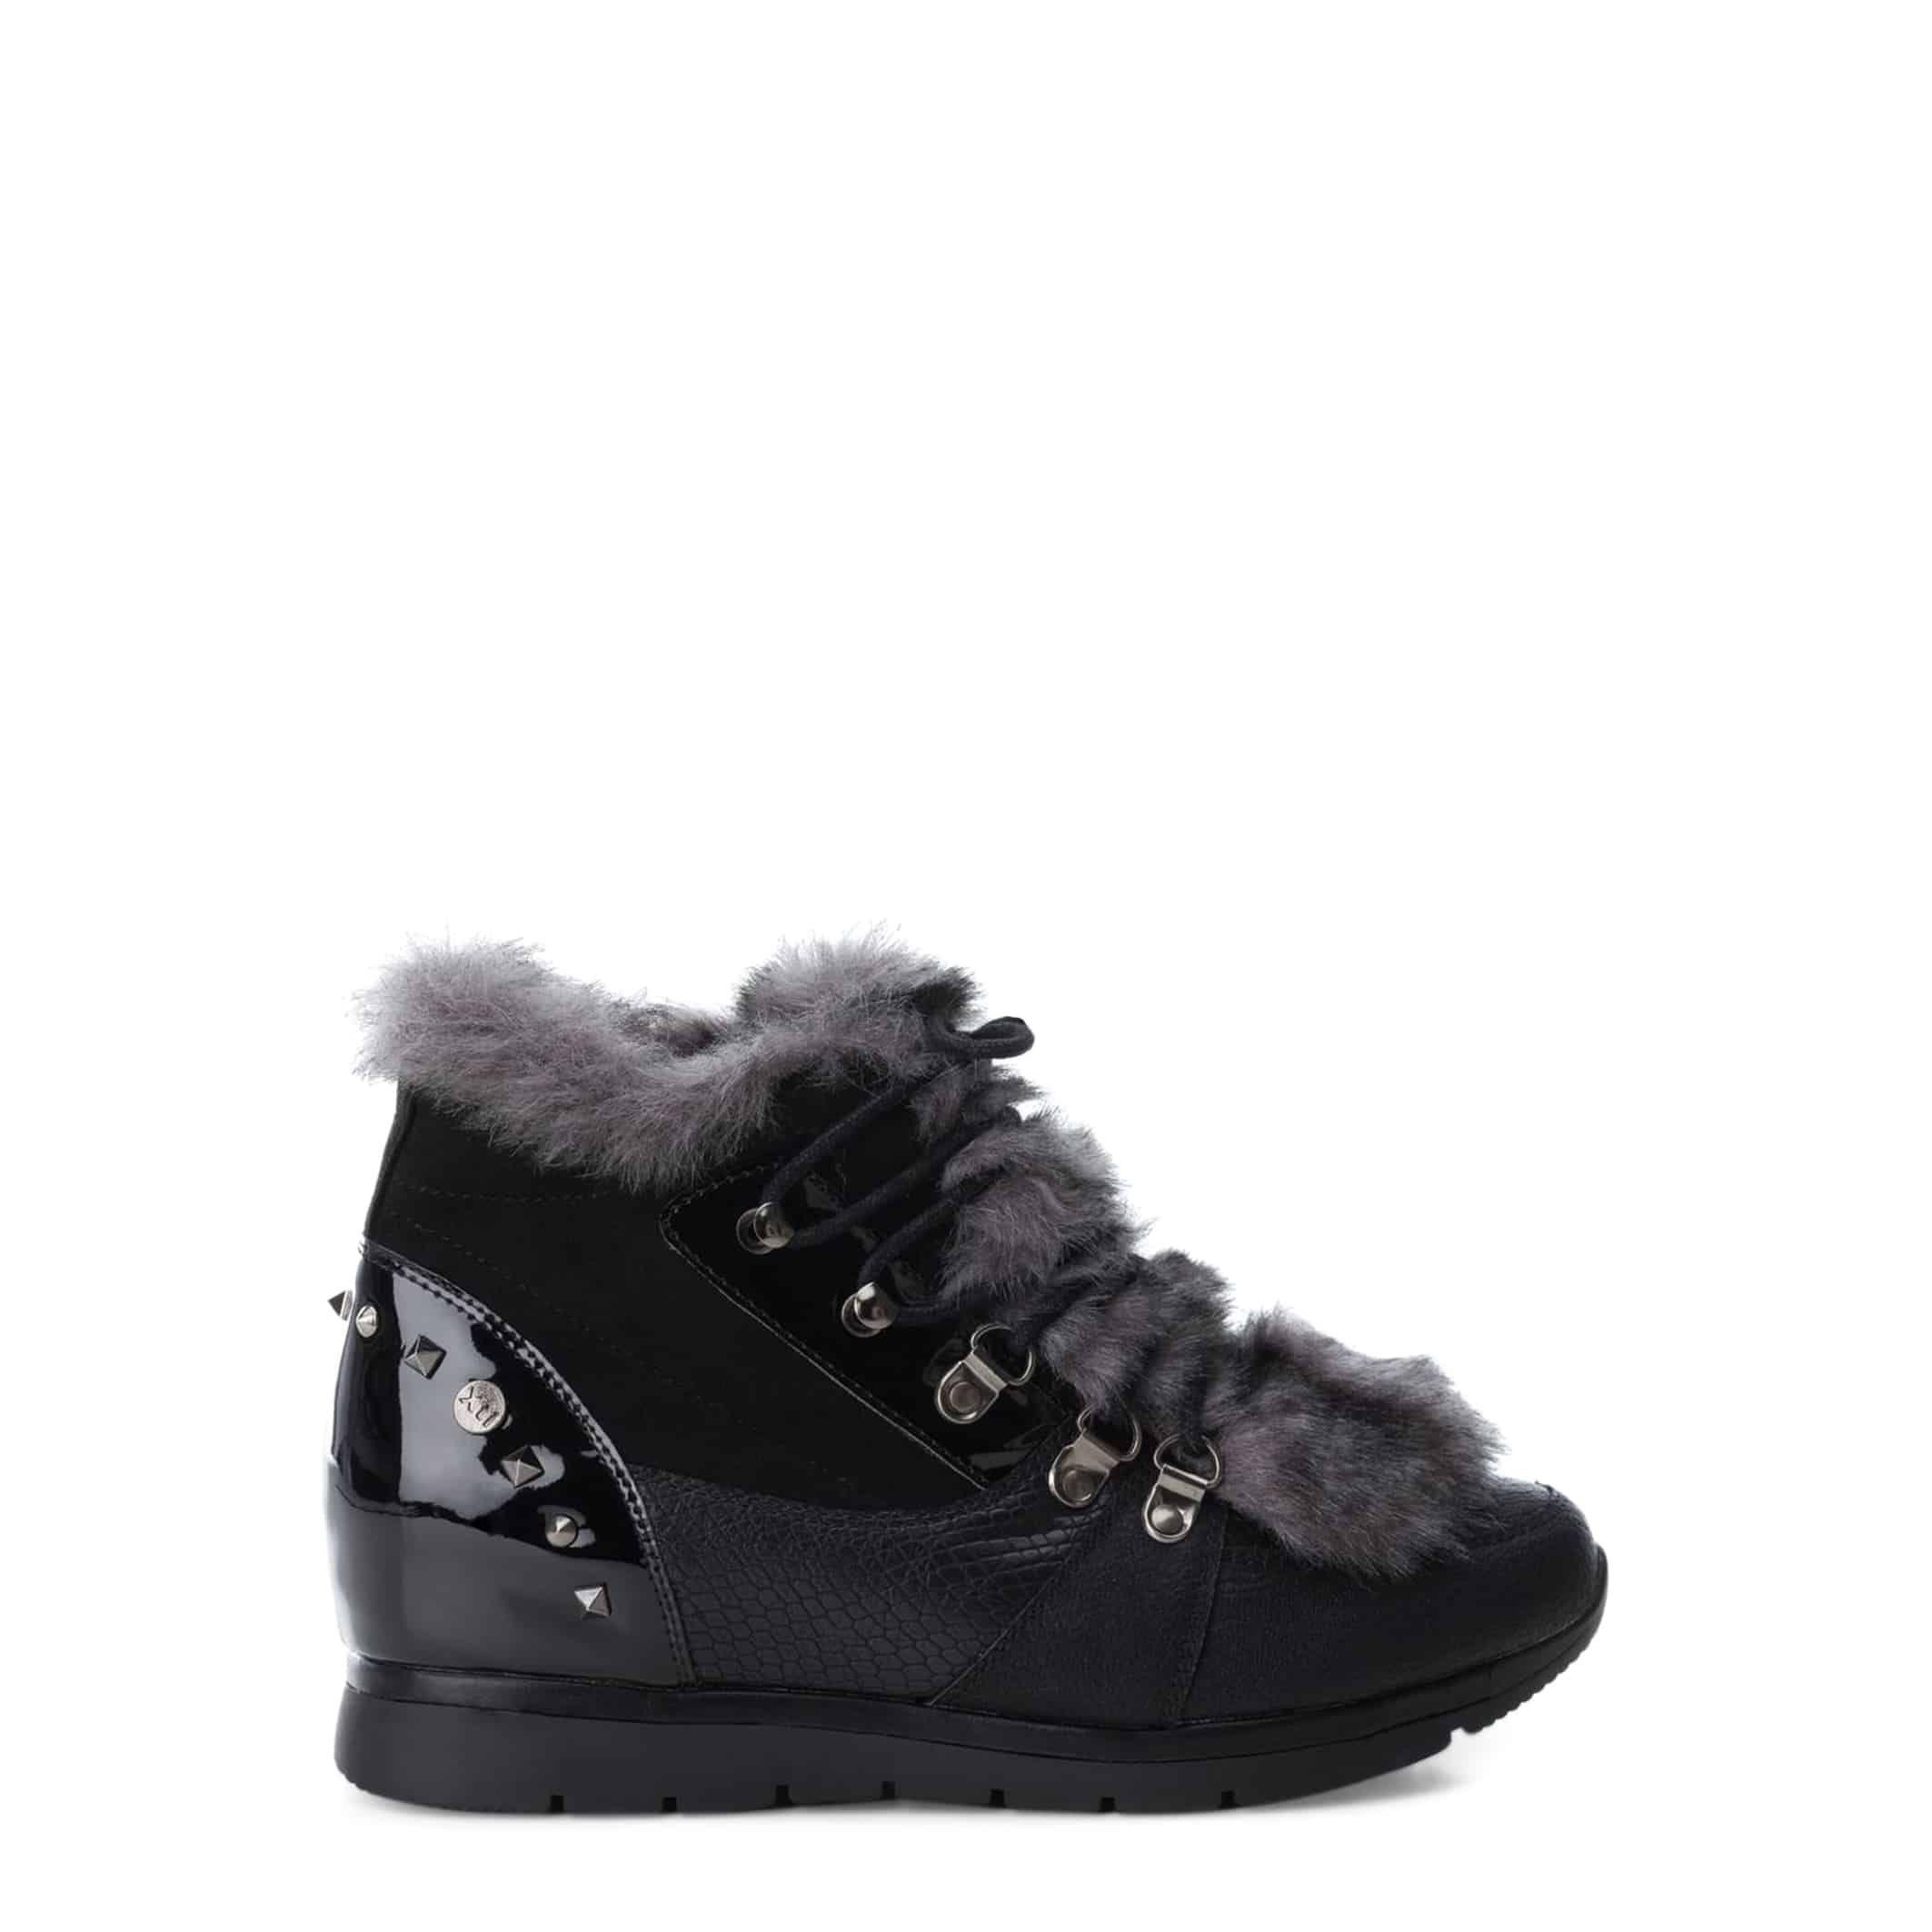 Schuhe Xti – 48288 – Schwarz